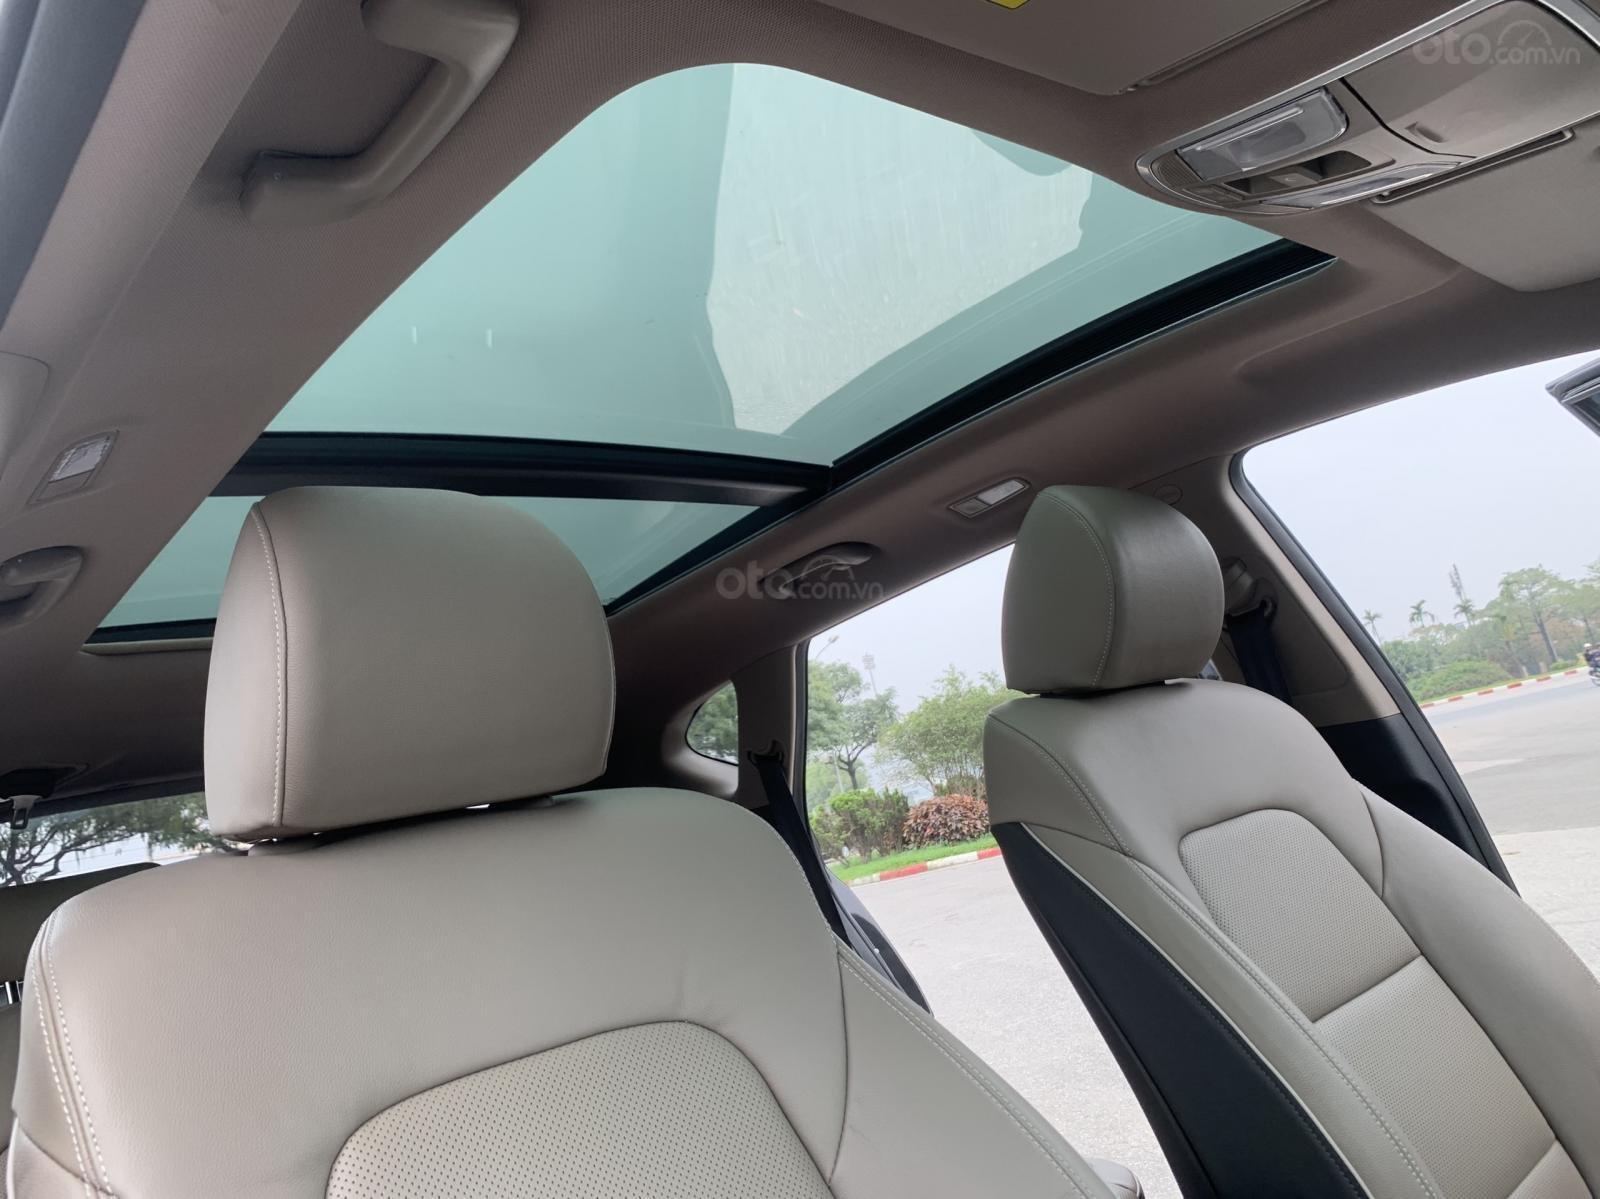 Cần bán gấp Hyundai Tucson 1.6 Turbo sx năm 2019, 878 triệu (15)